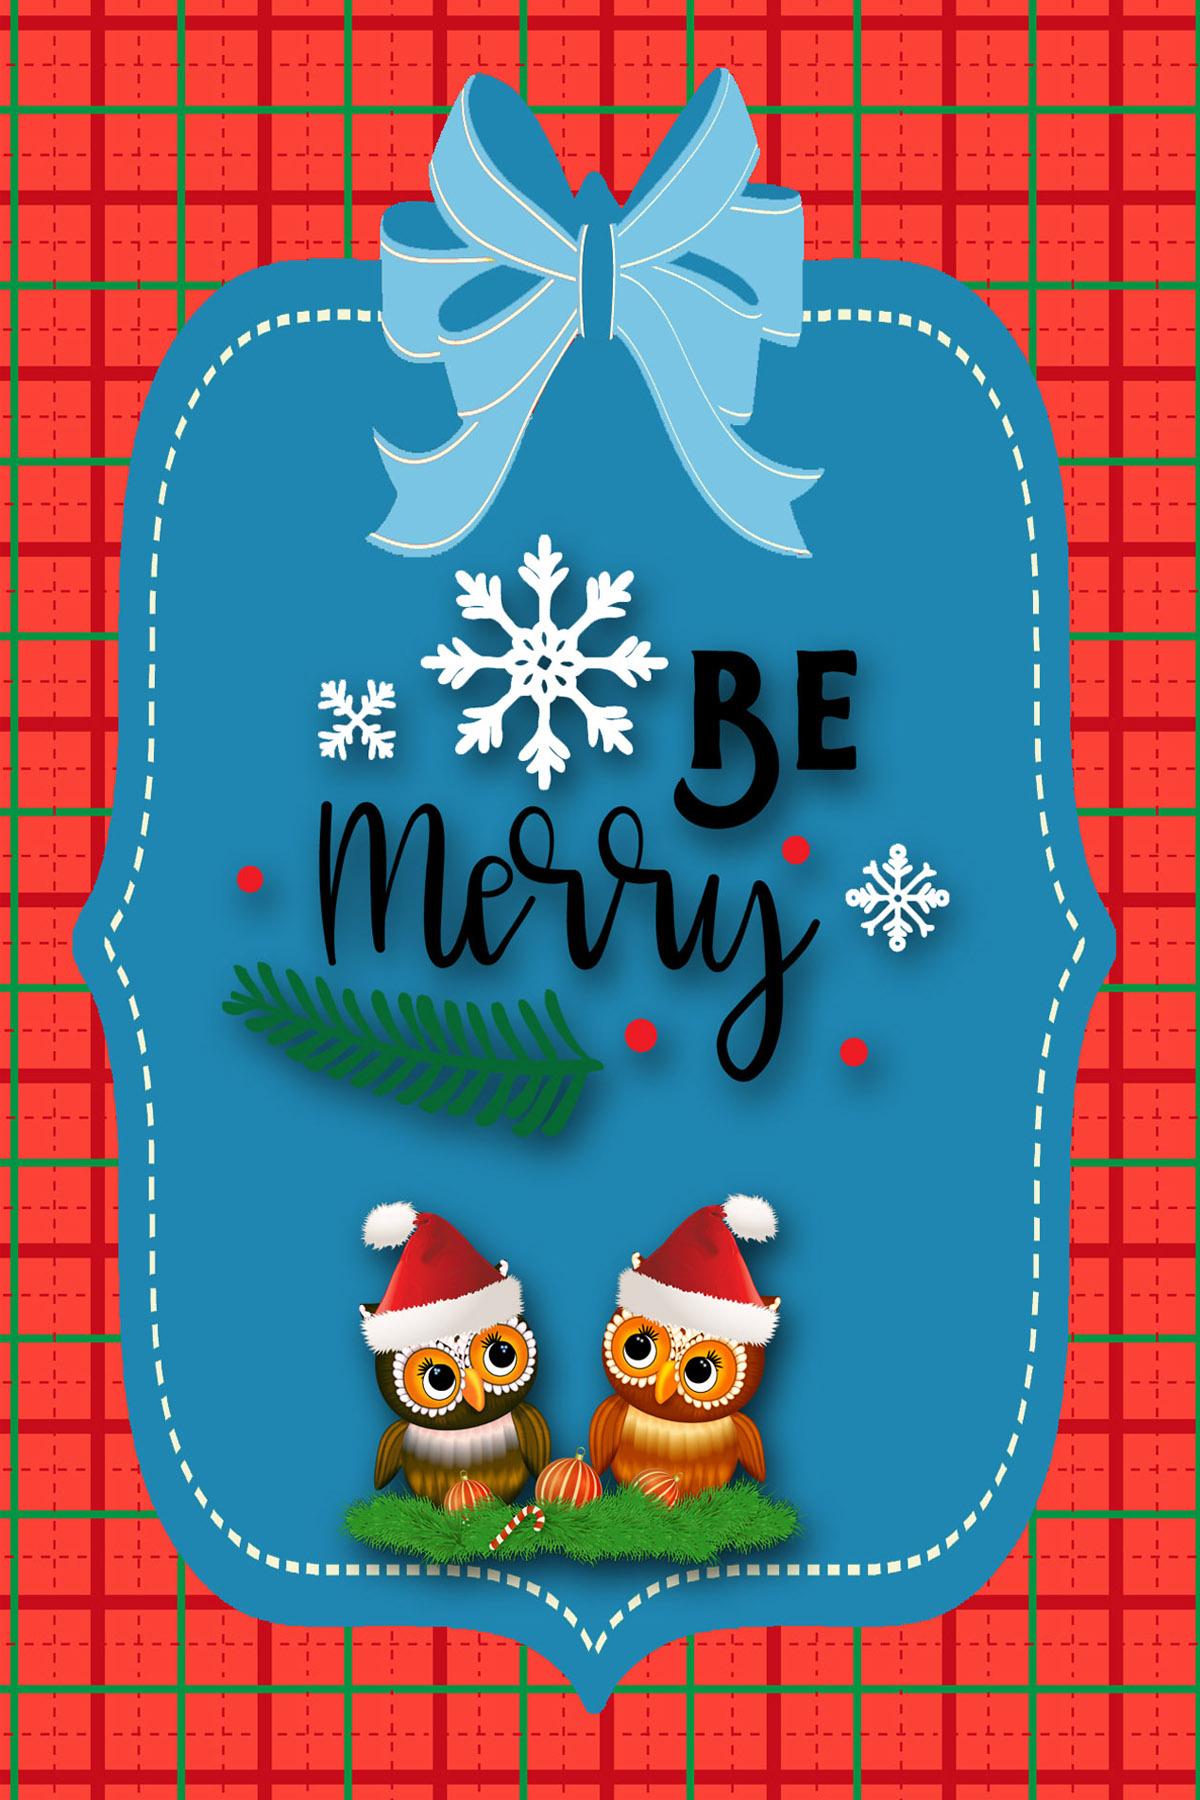 Digital Snowman Christmas Card, Printable Digital Christmas Card, Photo Christmas Card, Personalized Christmas Card, Happy Holidays Card example image 2